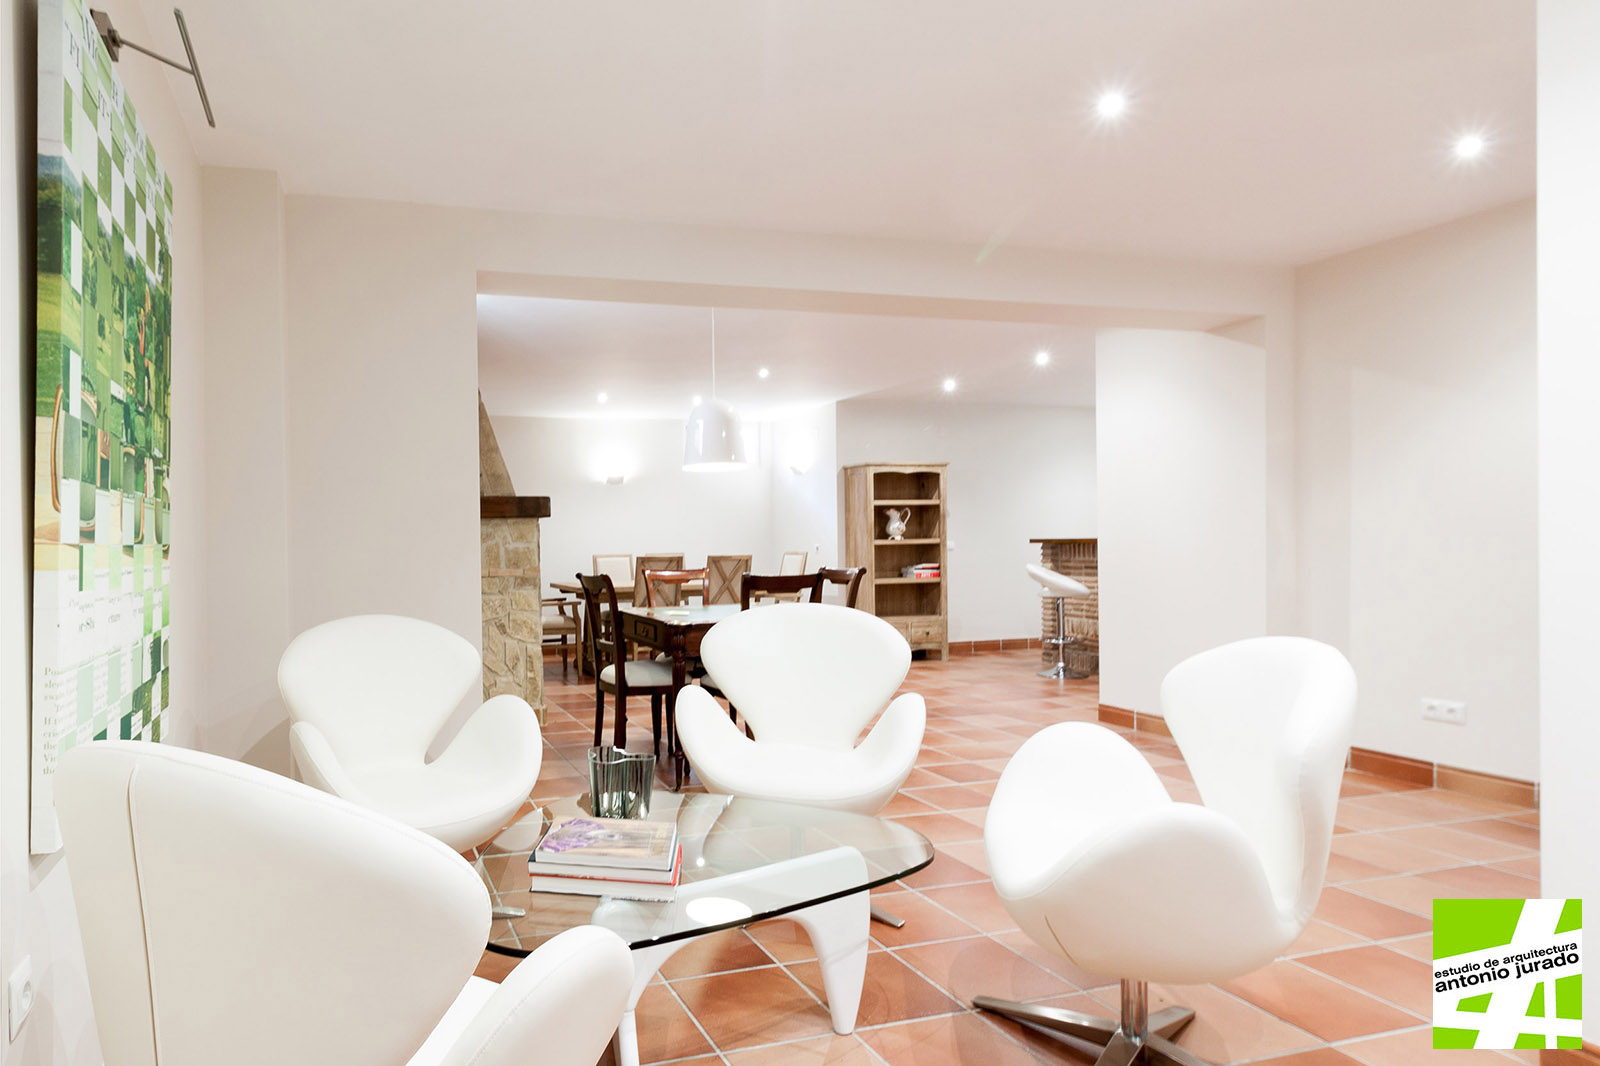 interiorismo-reforma-diseño-vivienda-torrox-park-malaga-antonio-jurado-arquitecto-04